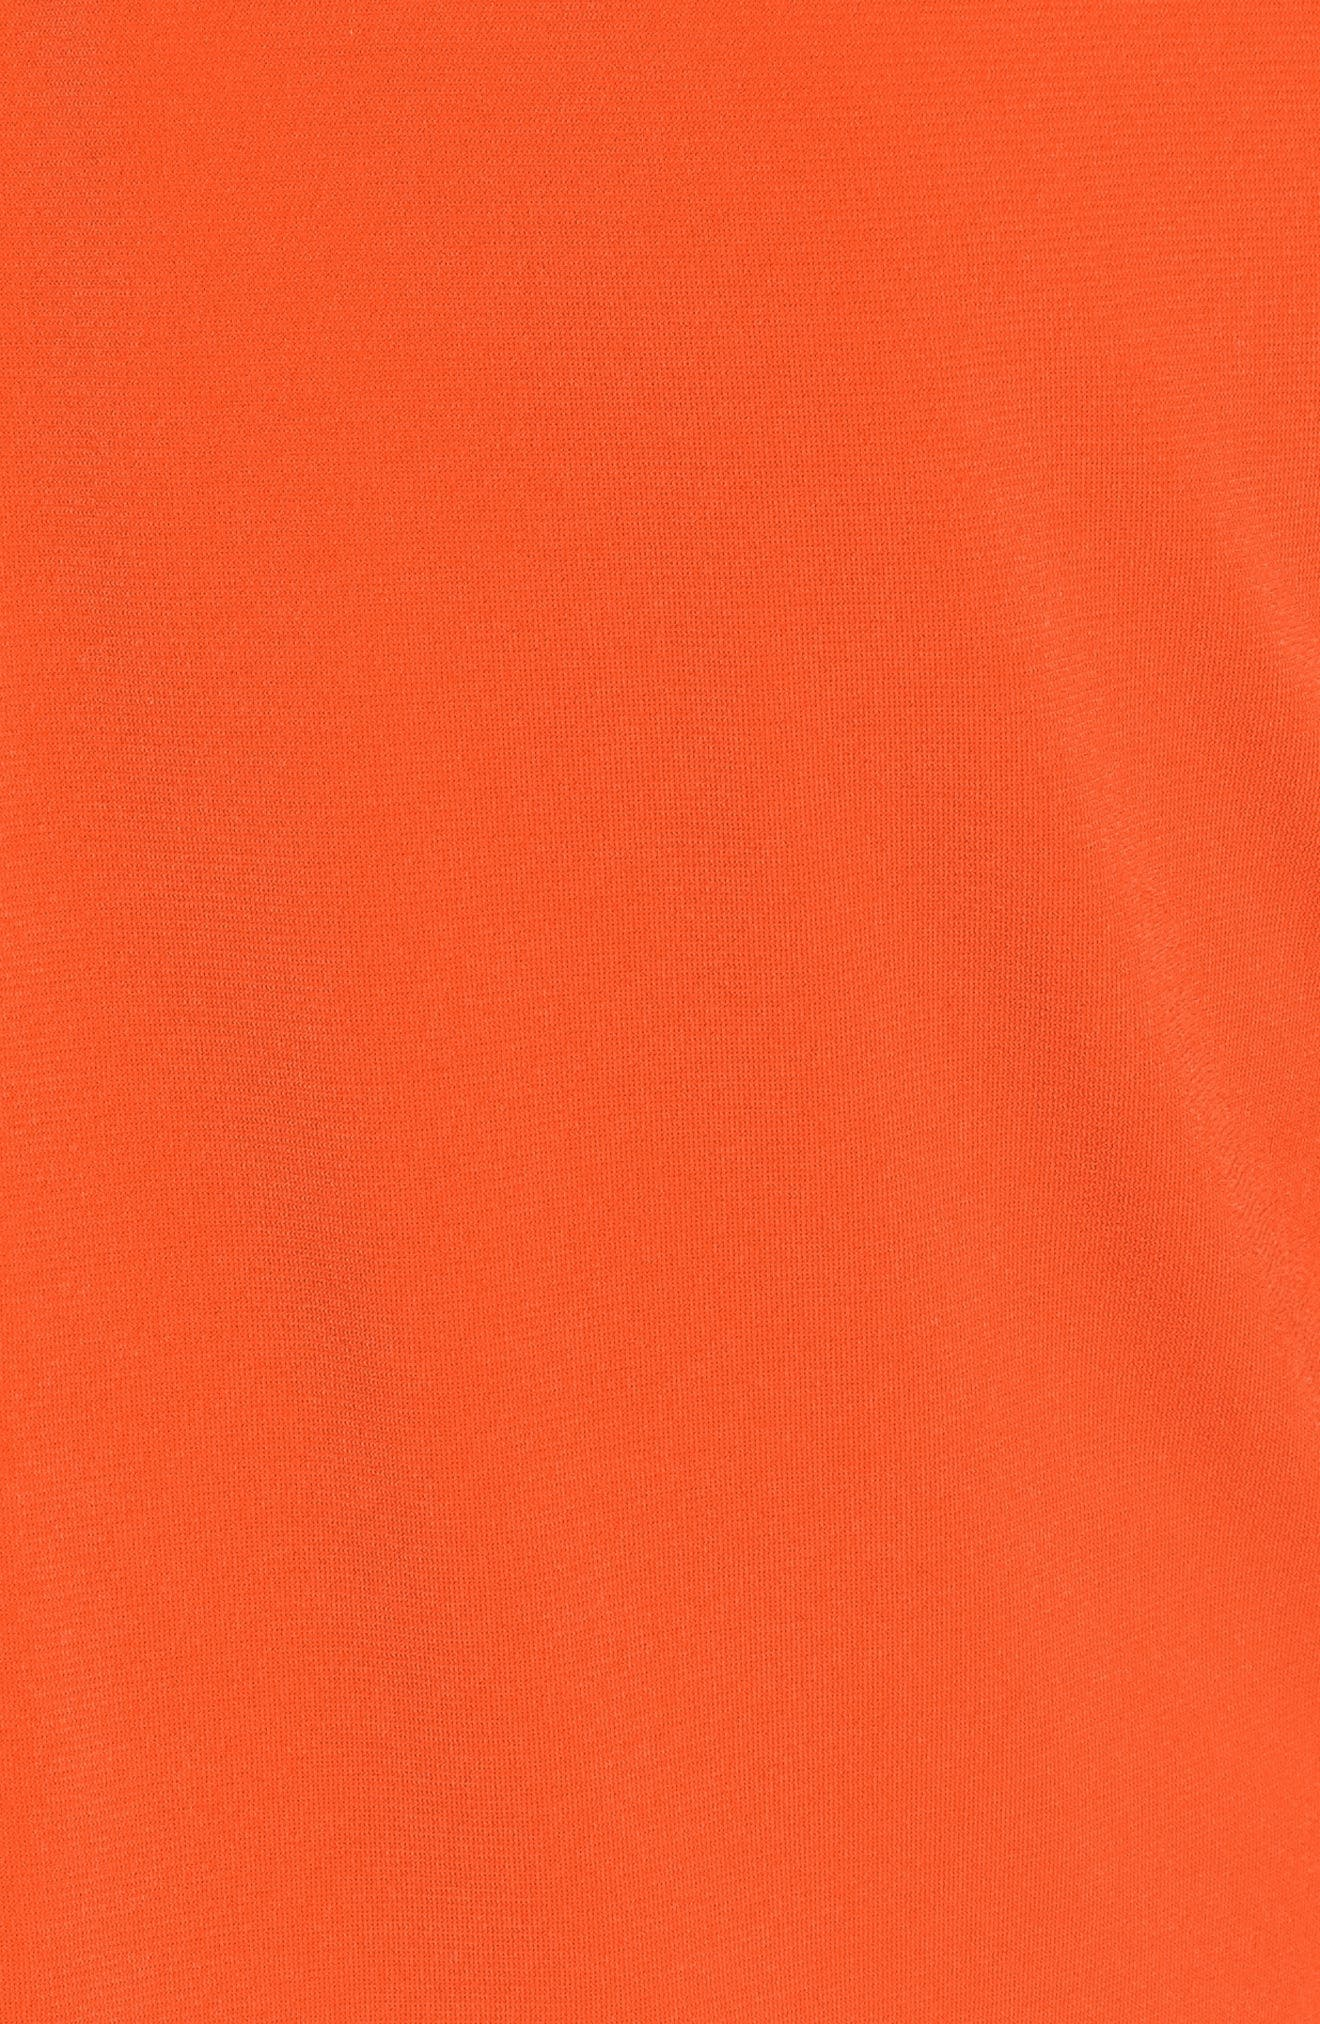 Neck Plate Cold Shoulder Top,                             Alternate thumbnail 5, color,                             816